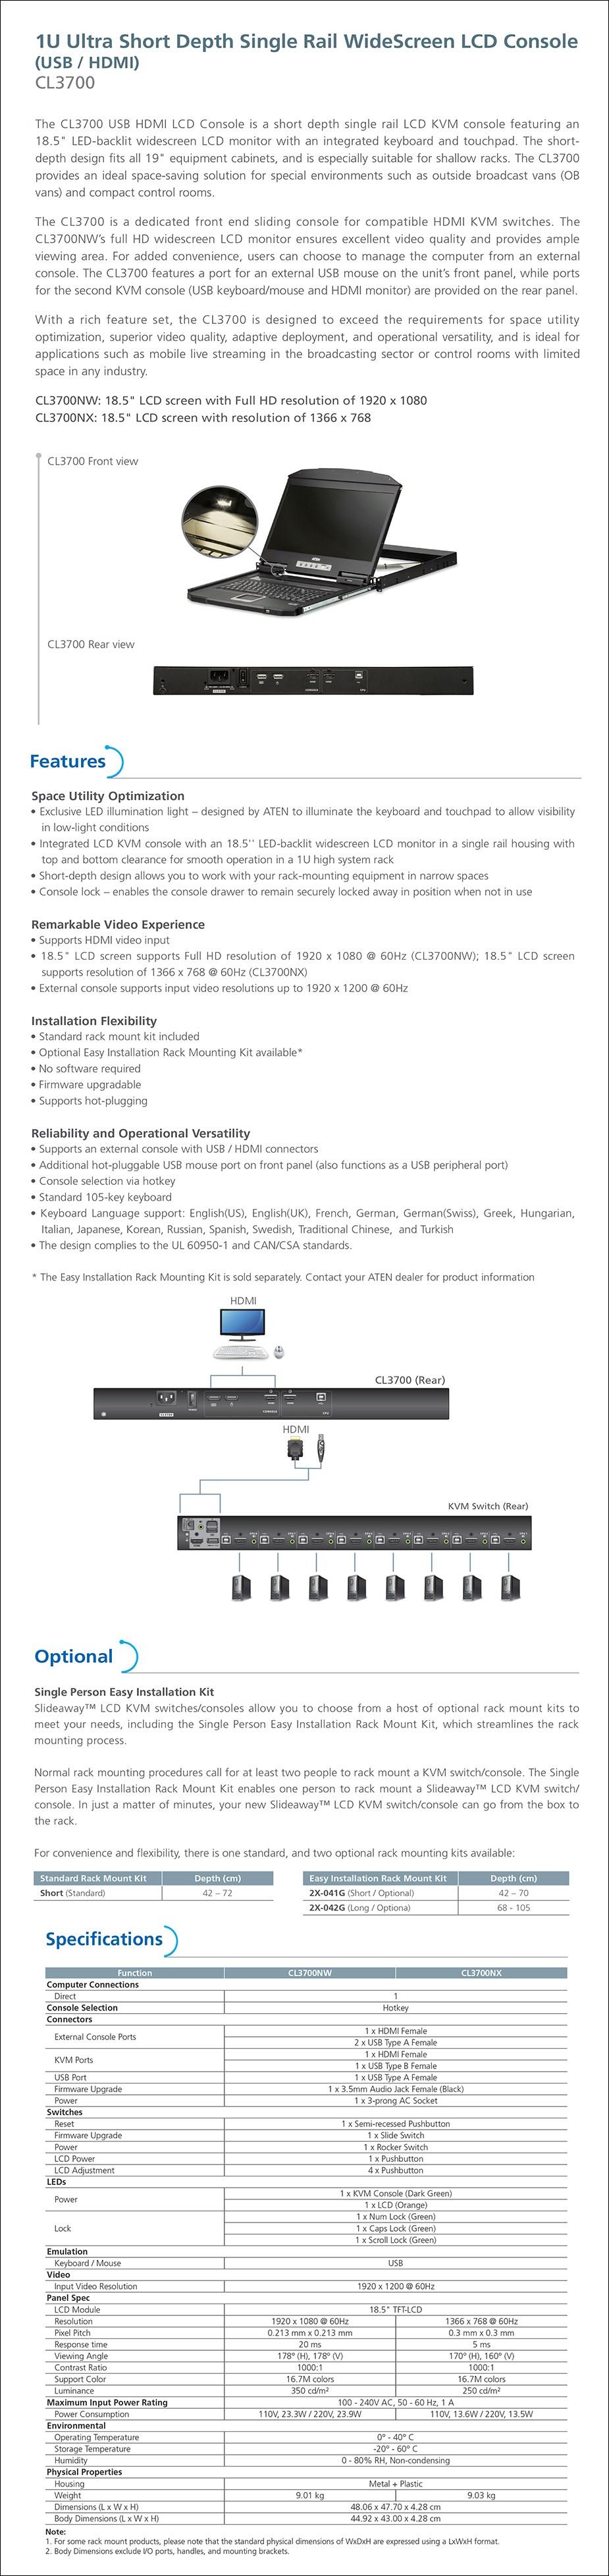 "ATEN CL3700 18.5"" HD 1U Ultra Short Depth Single Rail WideScreen LCD Console - Overview 1"